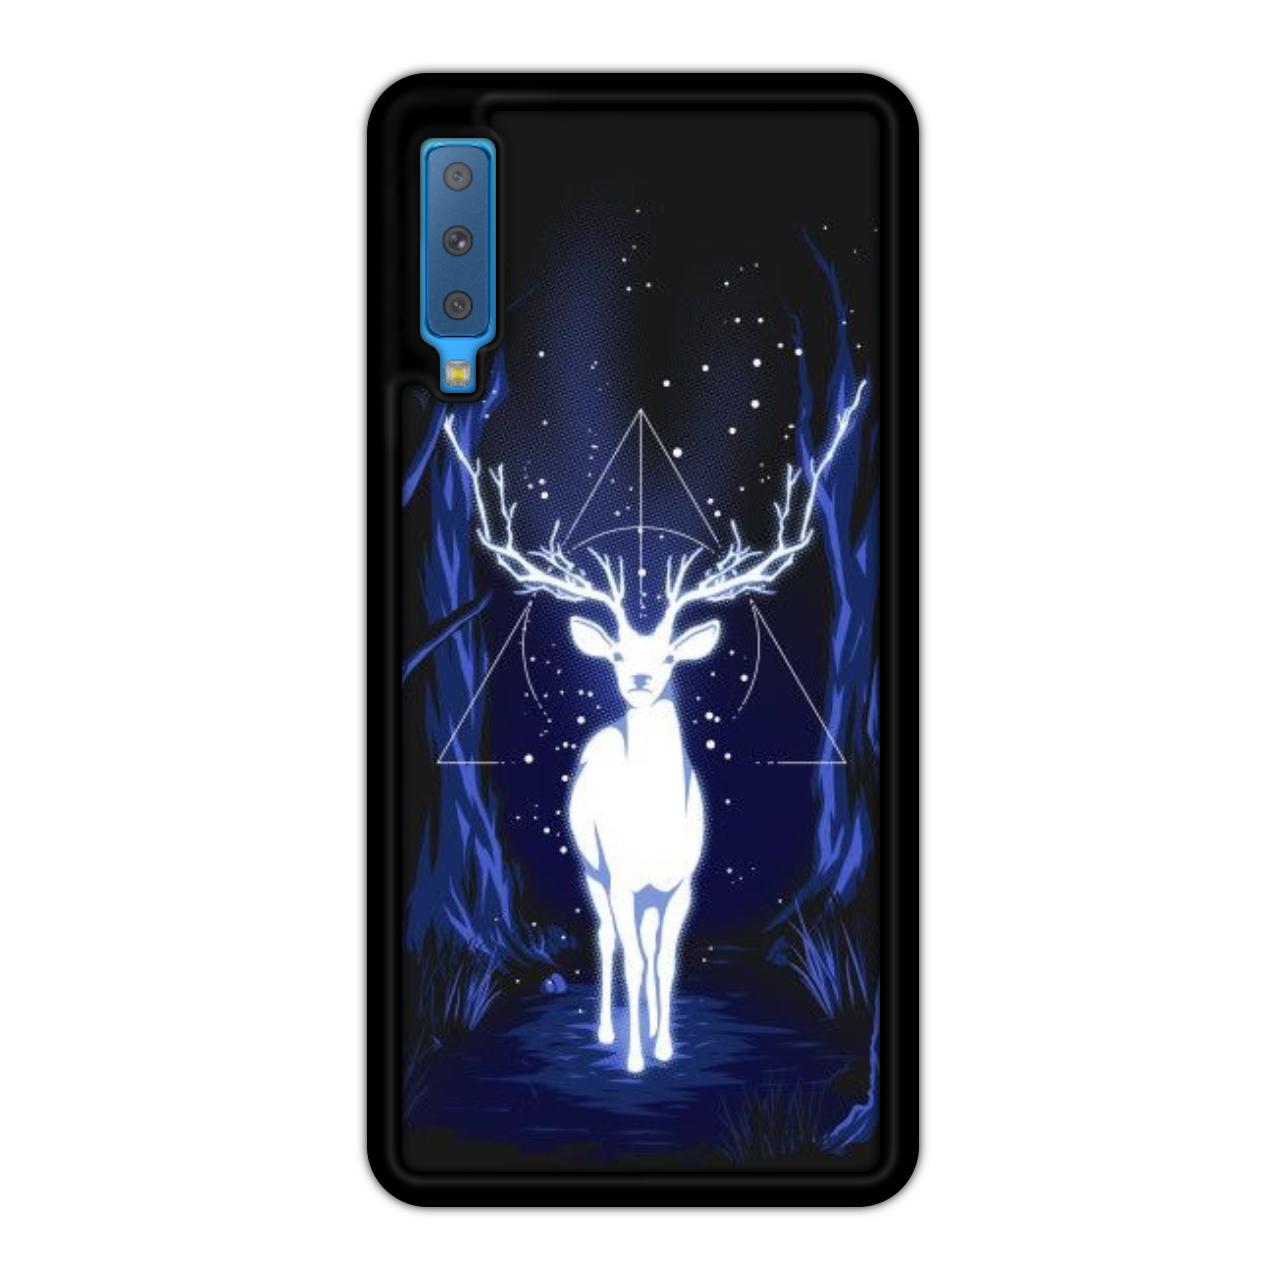 کاور آکام مدل Aasev1425 مناسب برای گوشی موبایل سامسونگ Galaxy A7 2018